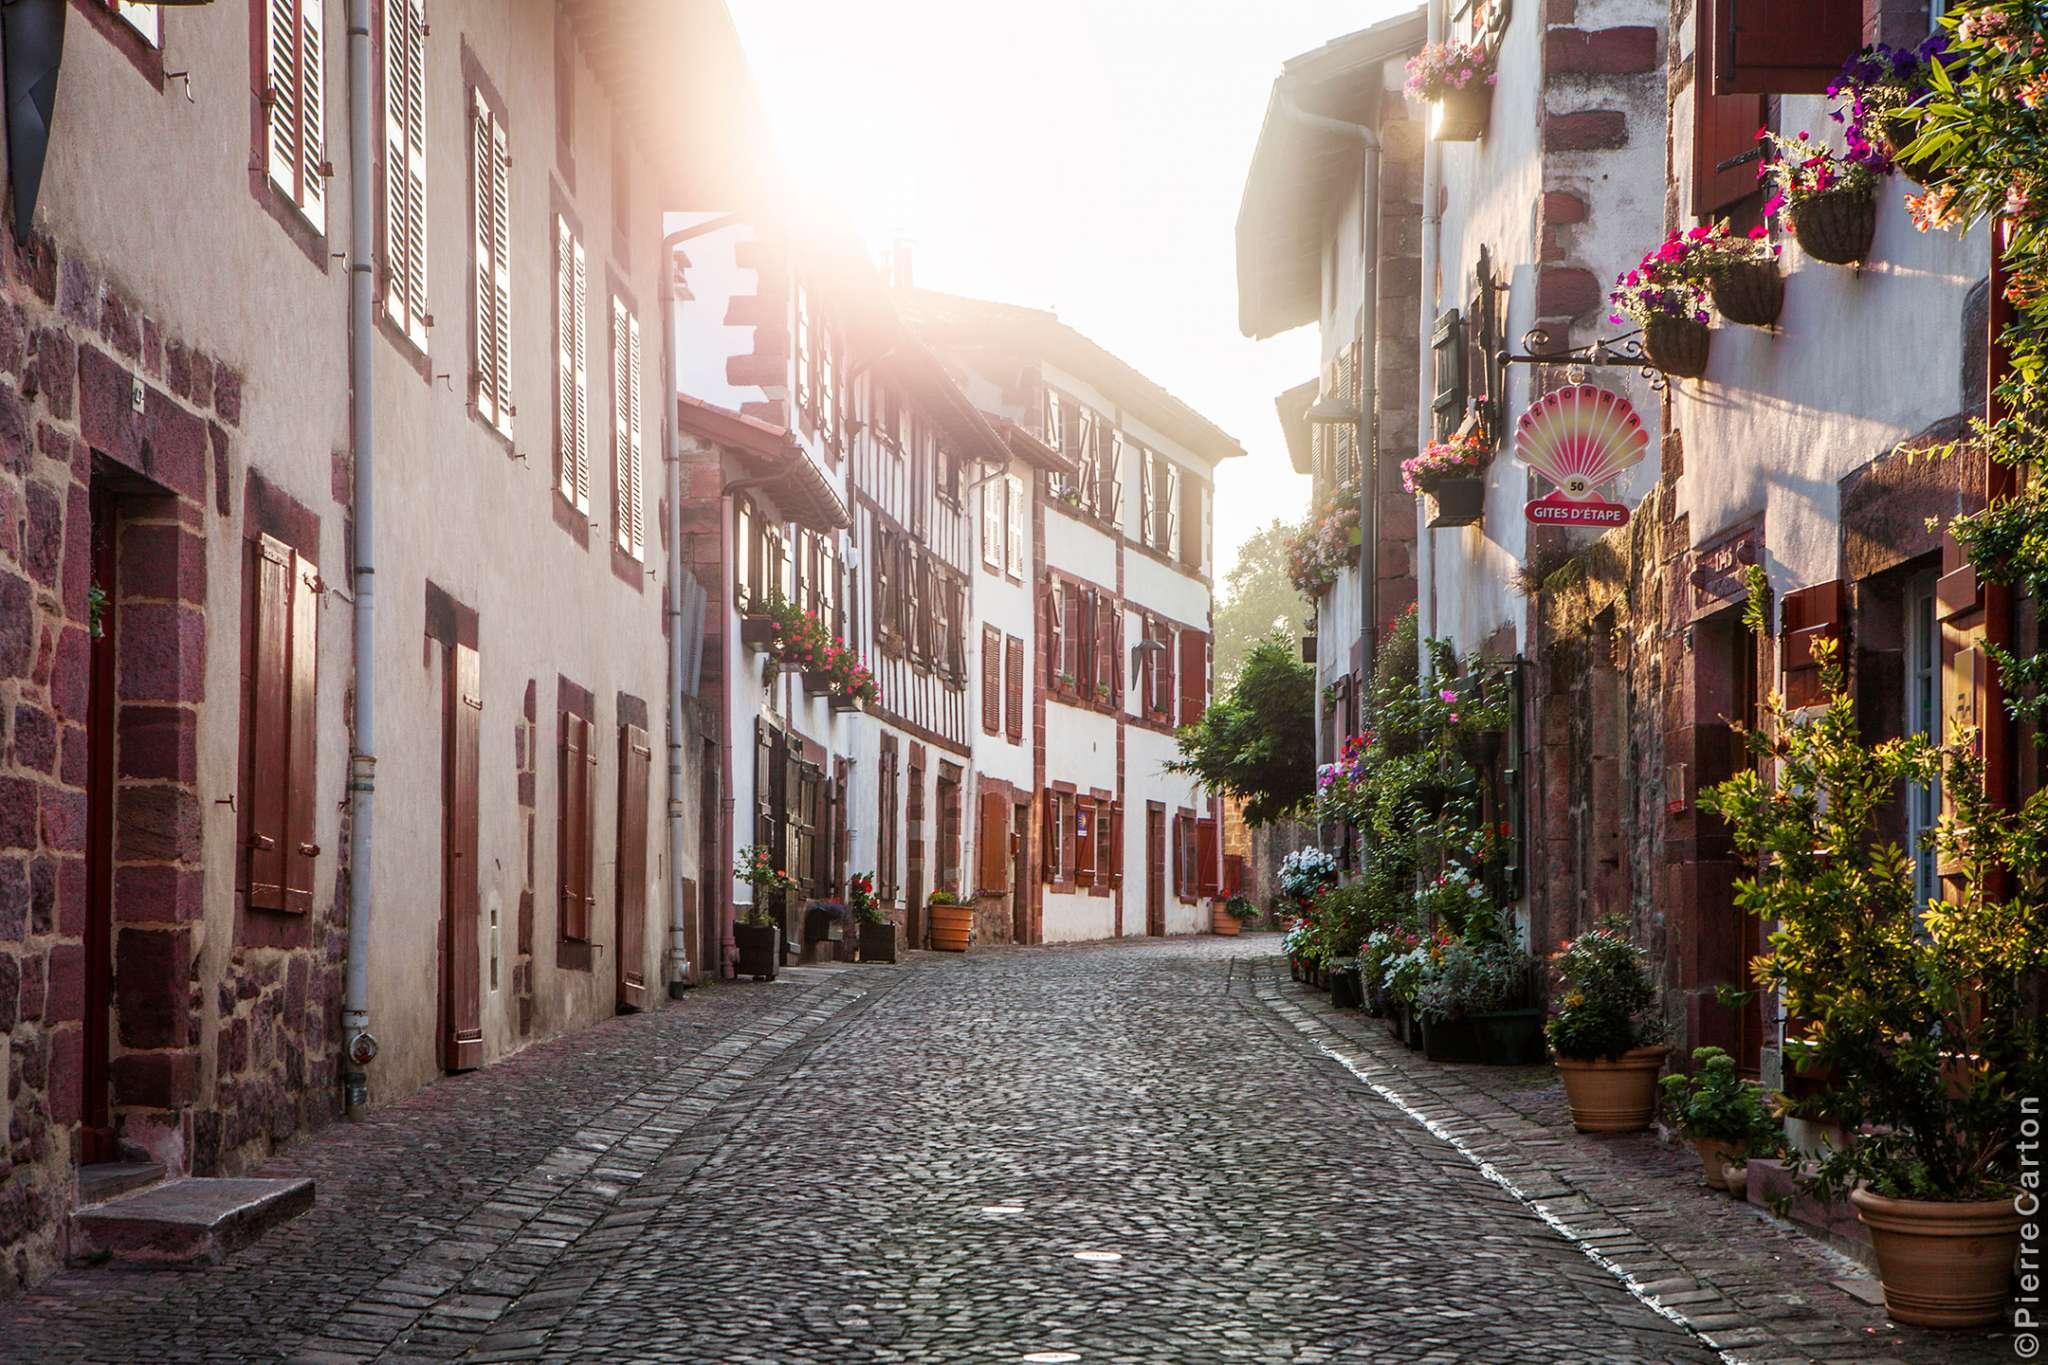 rue-de-la-citadelle-matin-st-jean-pied-de-port-bd-carton